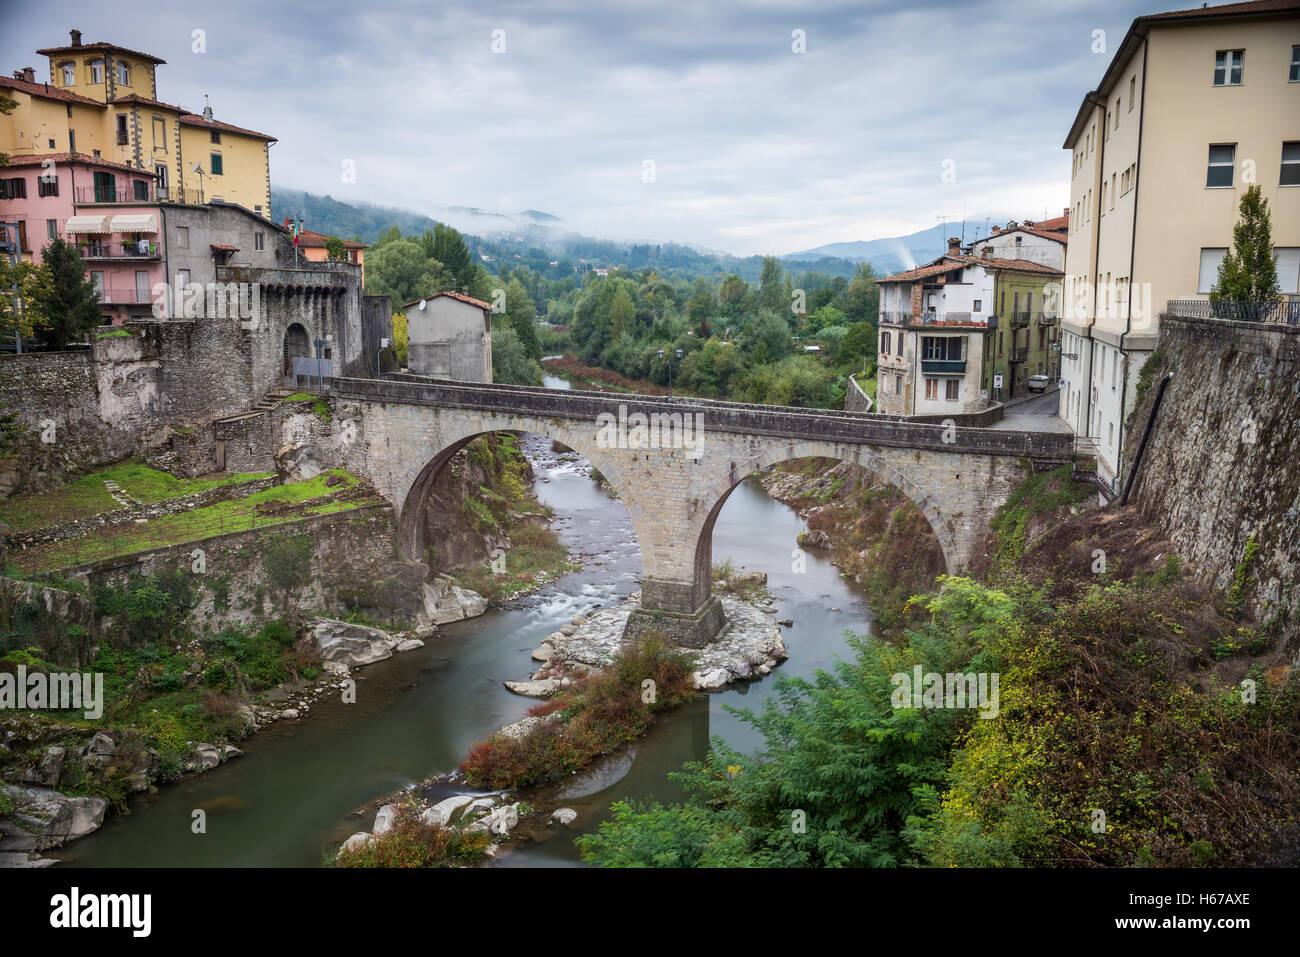 Castelnuovo di Garfagnana, Tuscany, Italy, EU, Europe - Stock Image